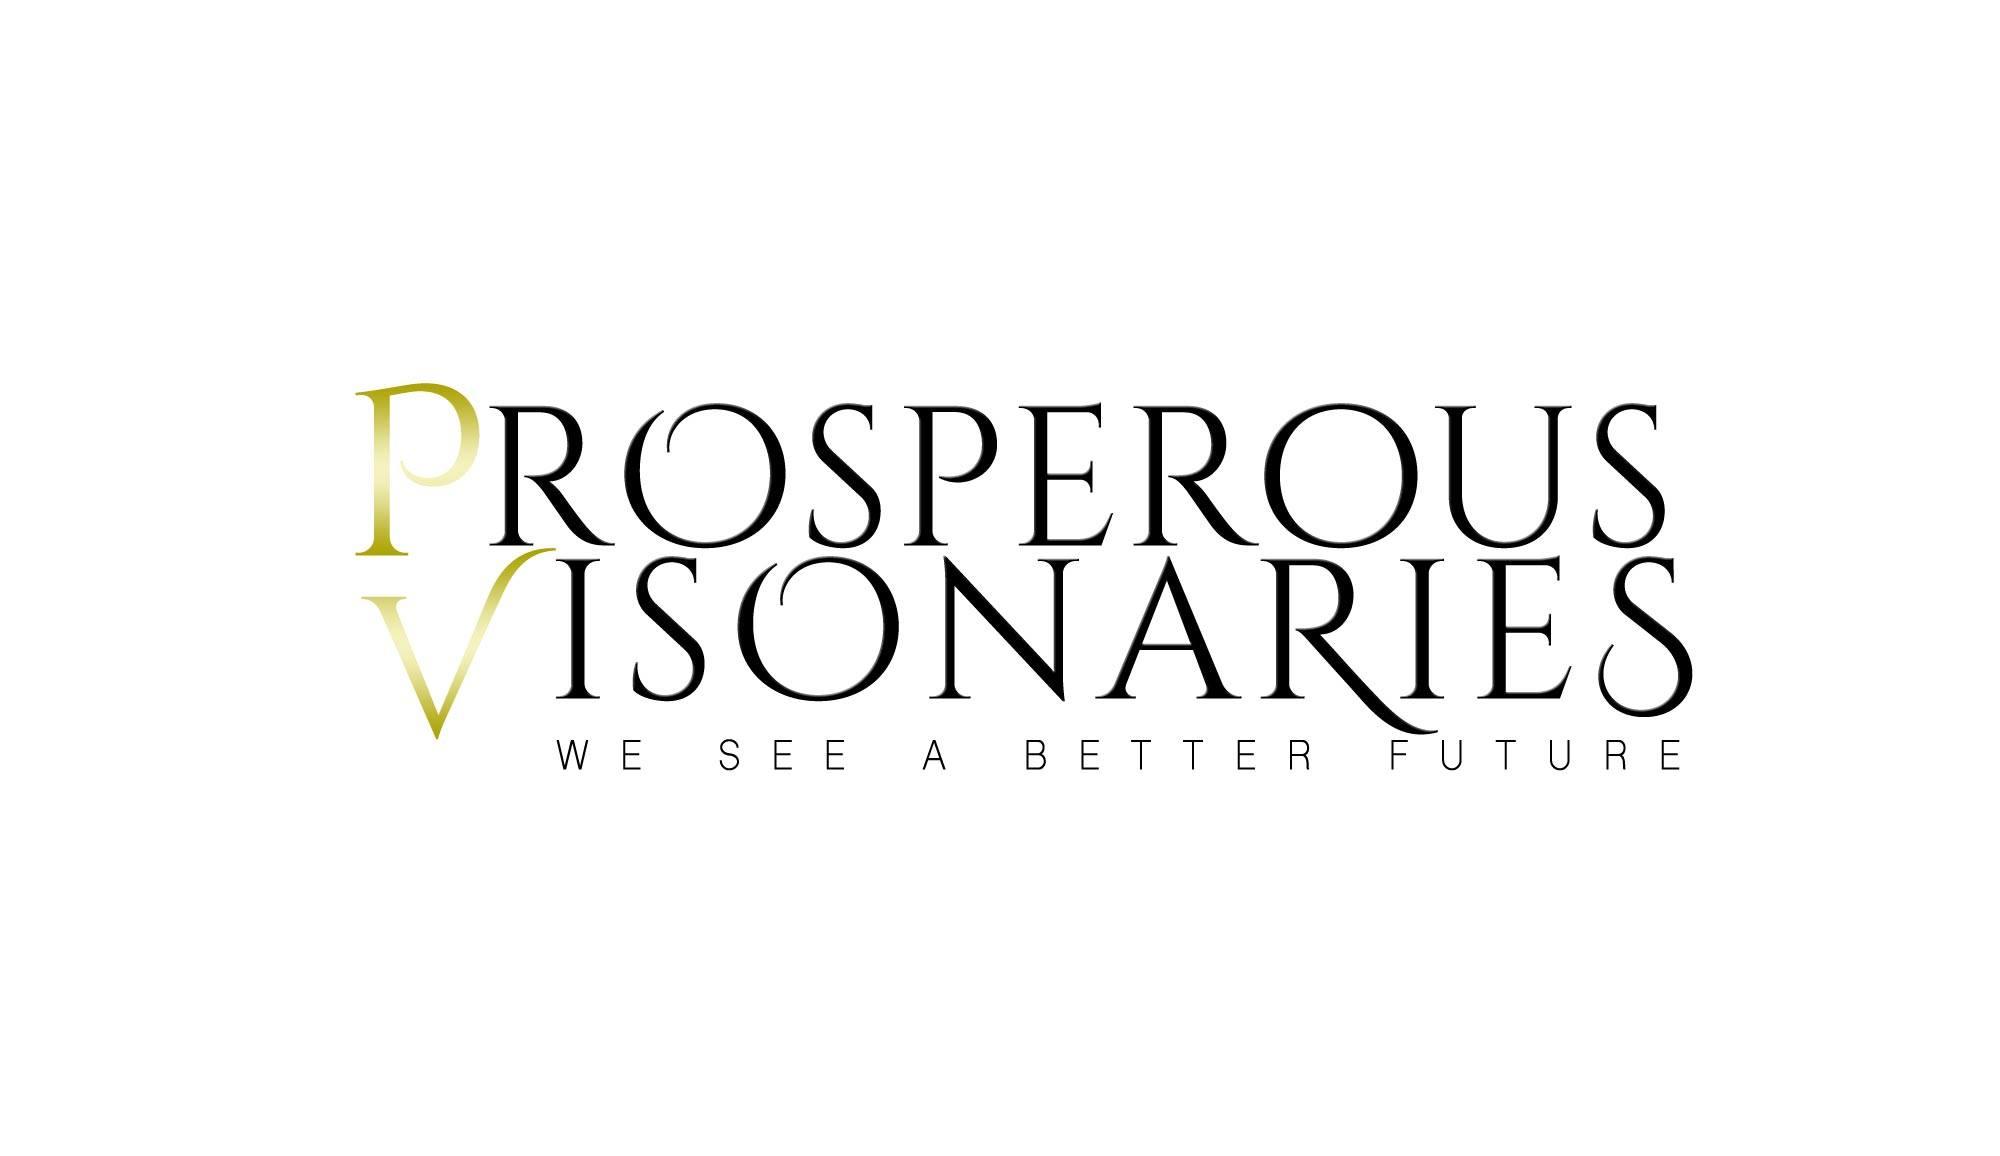 Prosperous Visionaries